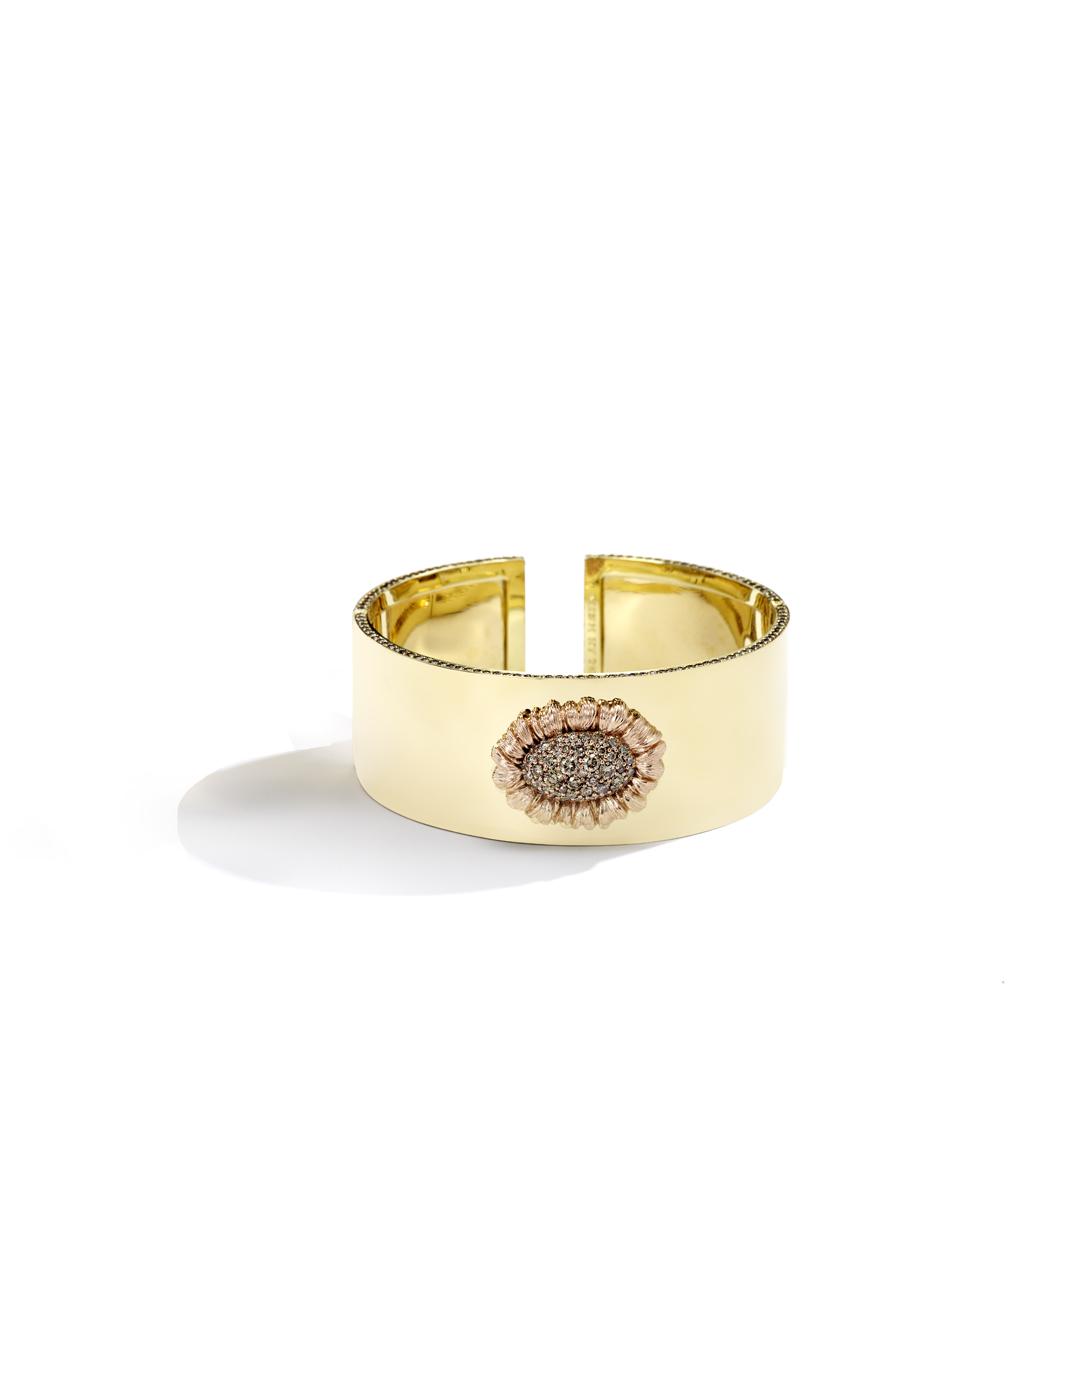 mish_jewelry_product_Nigella-RG-Cuff-1